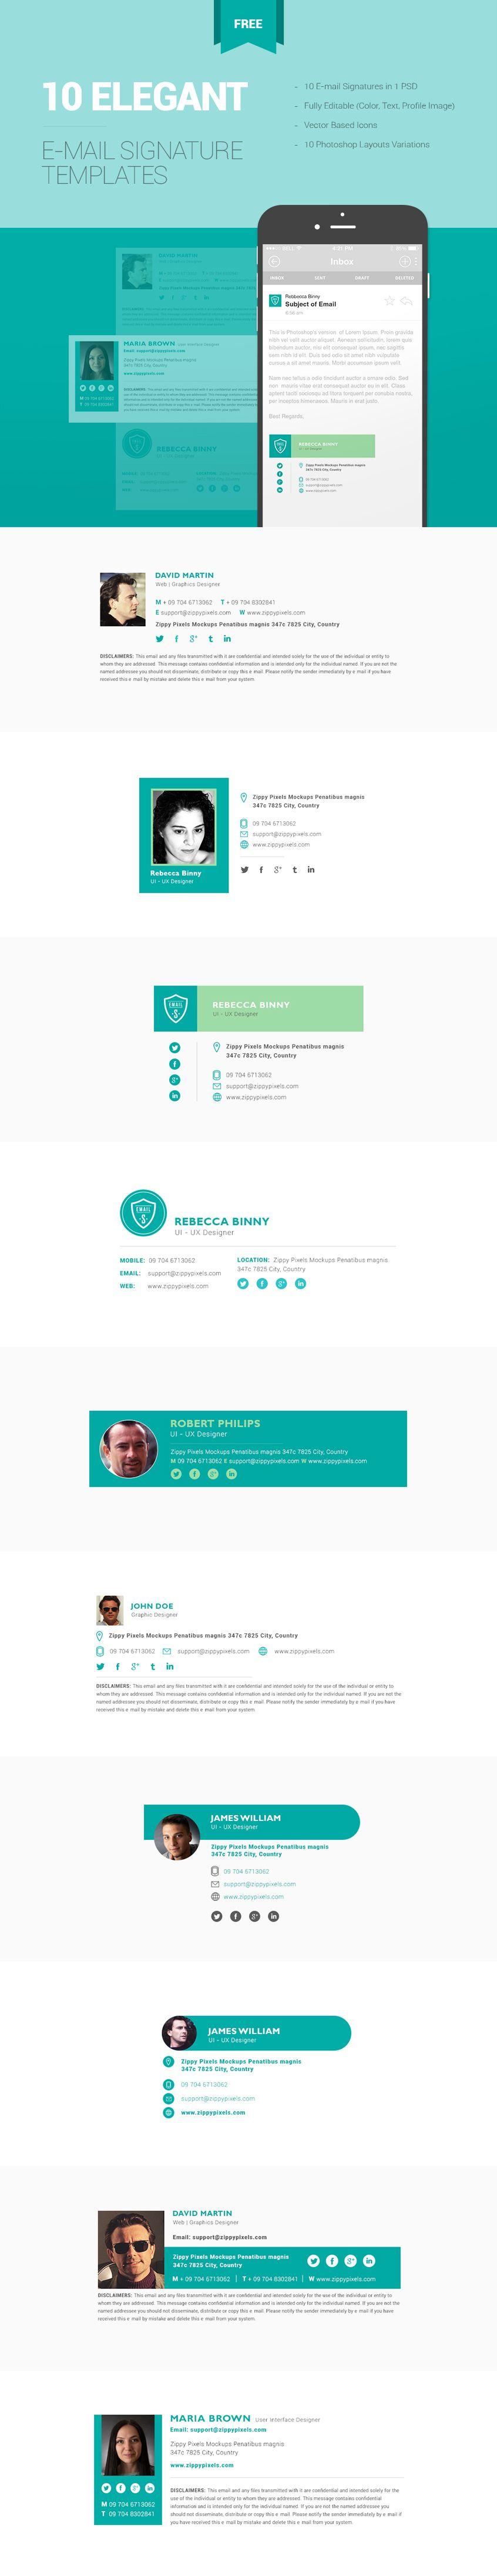 10 Plantillas PSD gratis para crear firmas de correo electrónico ...